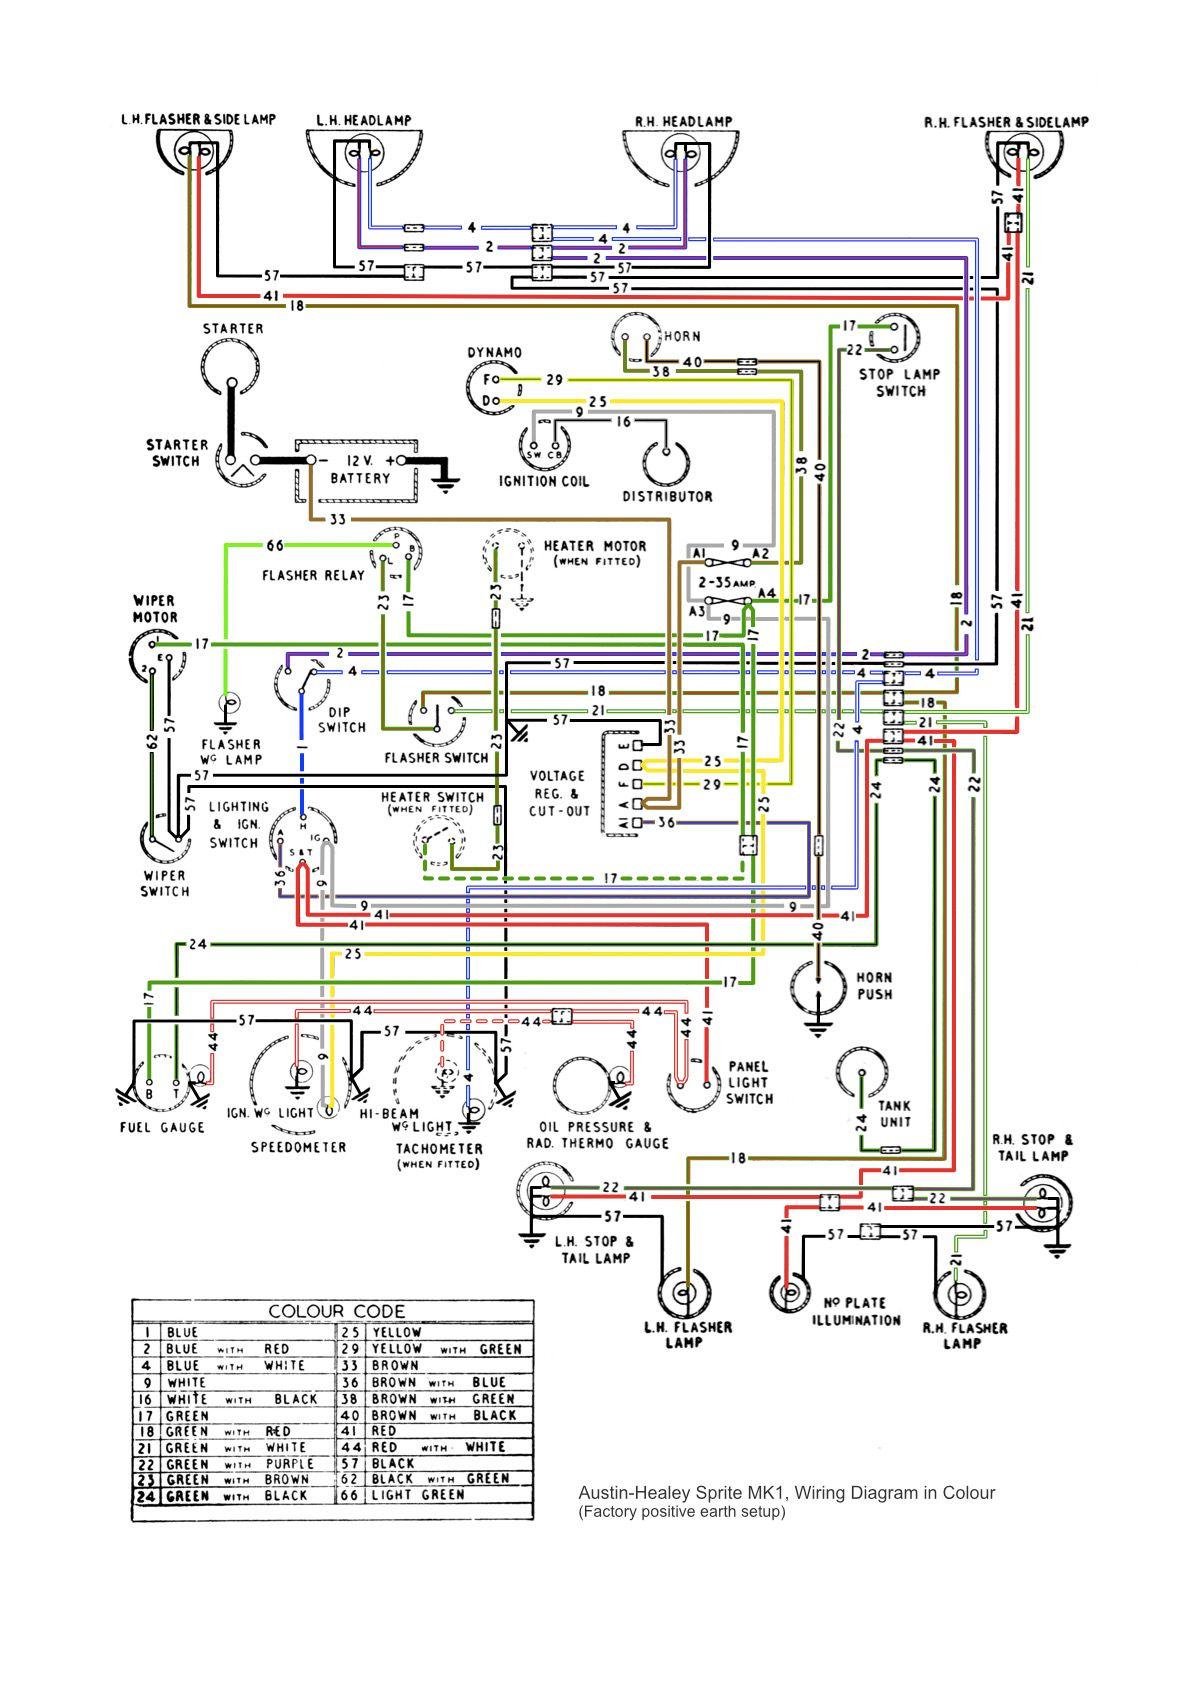 mga wire diagram wiring diagram mga battery wiring diagram [ 1190 x 1684 Pixel ]